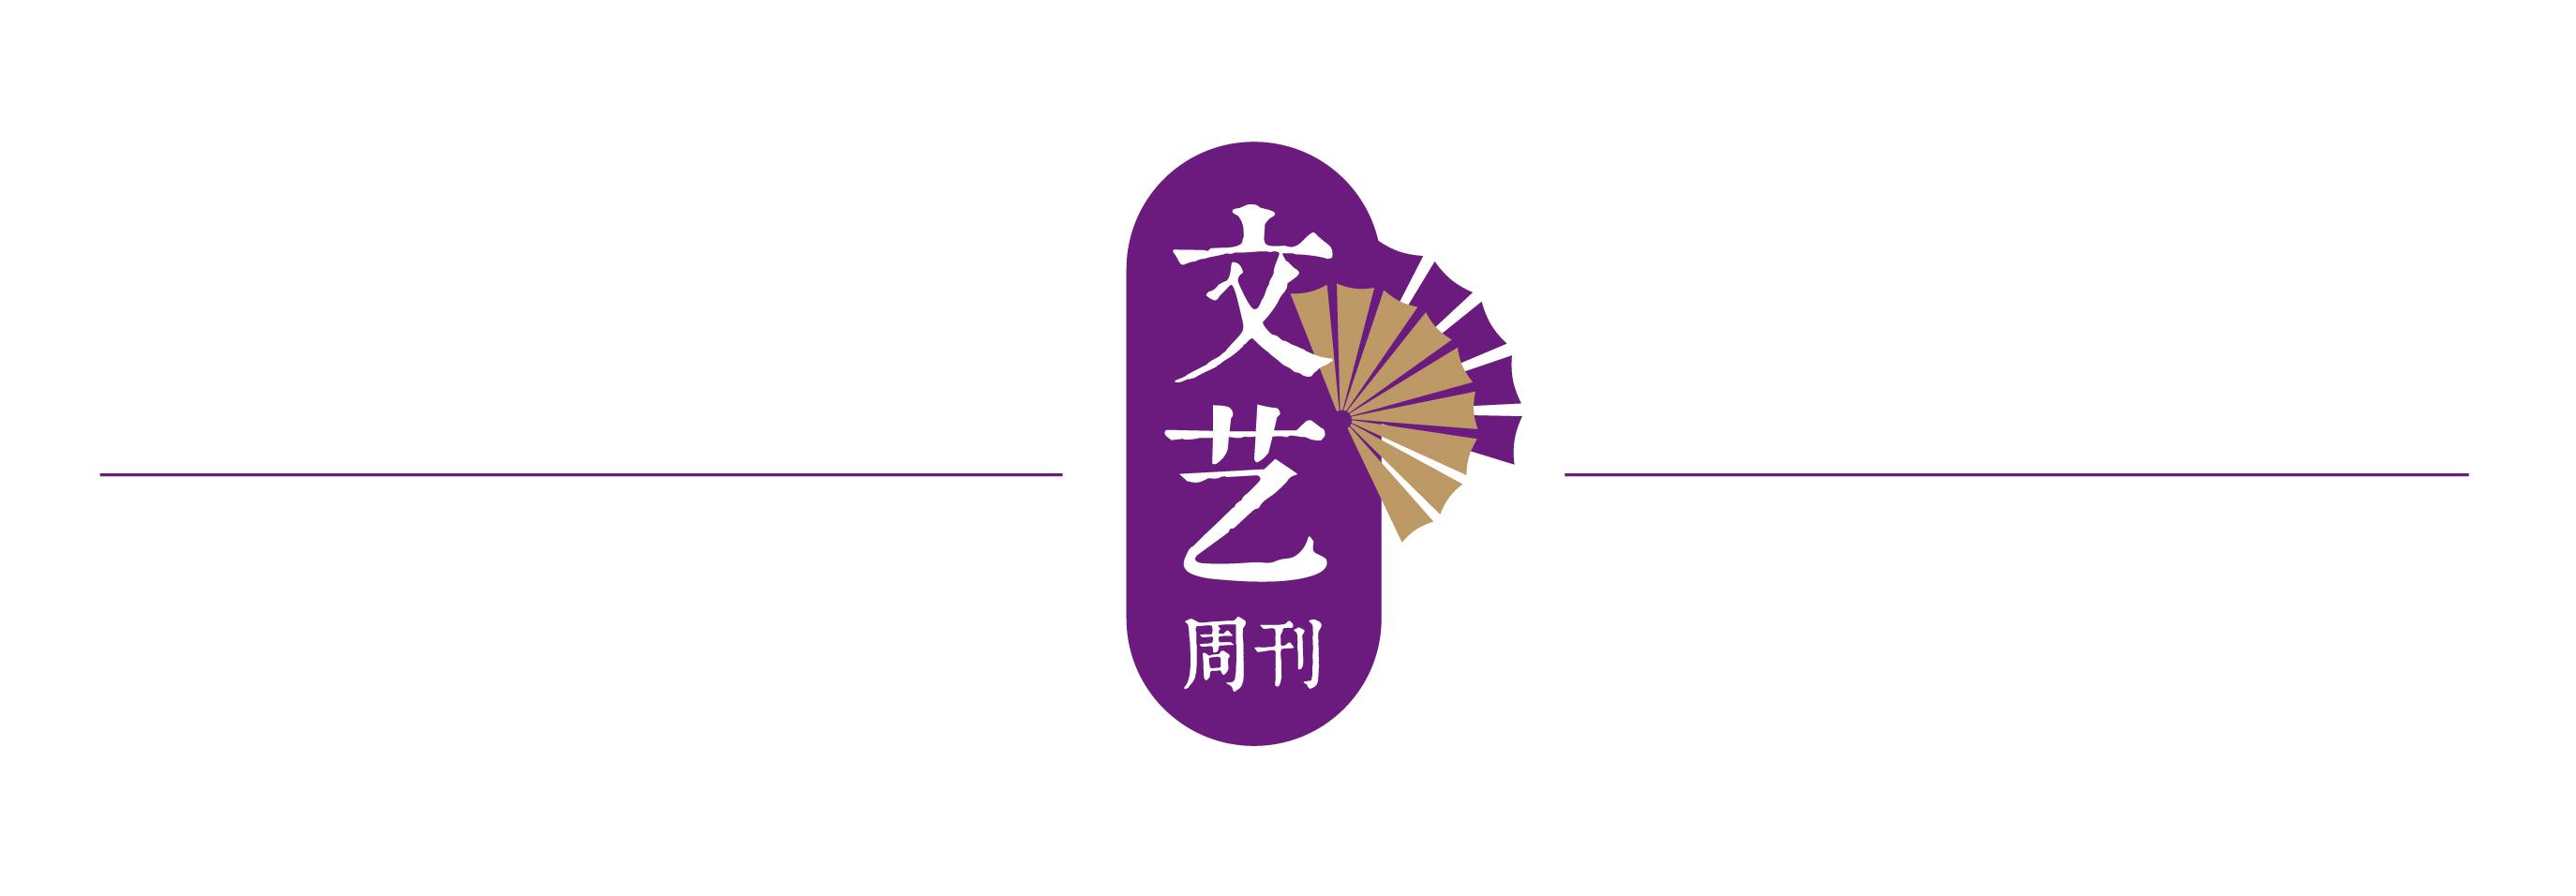 http://www.bjgjt.com/tiyuhuodong/156447.html